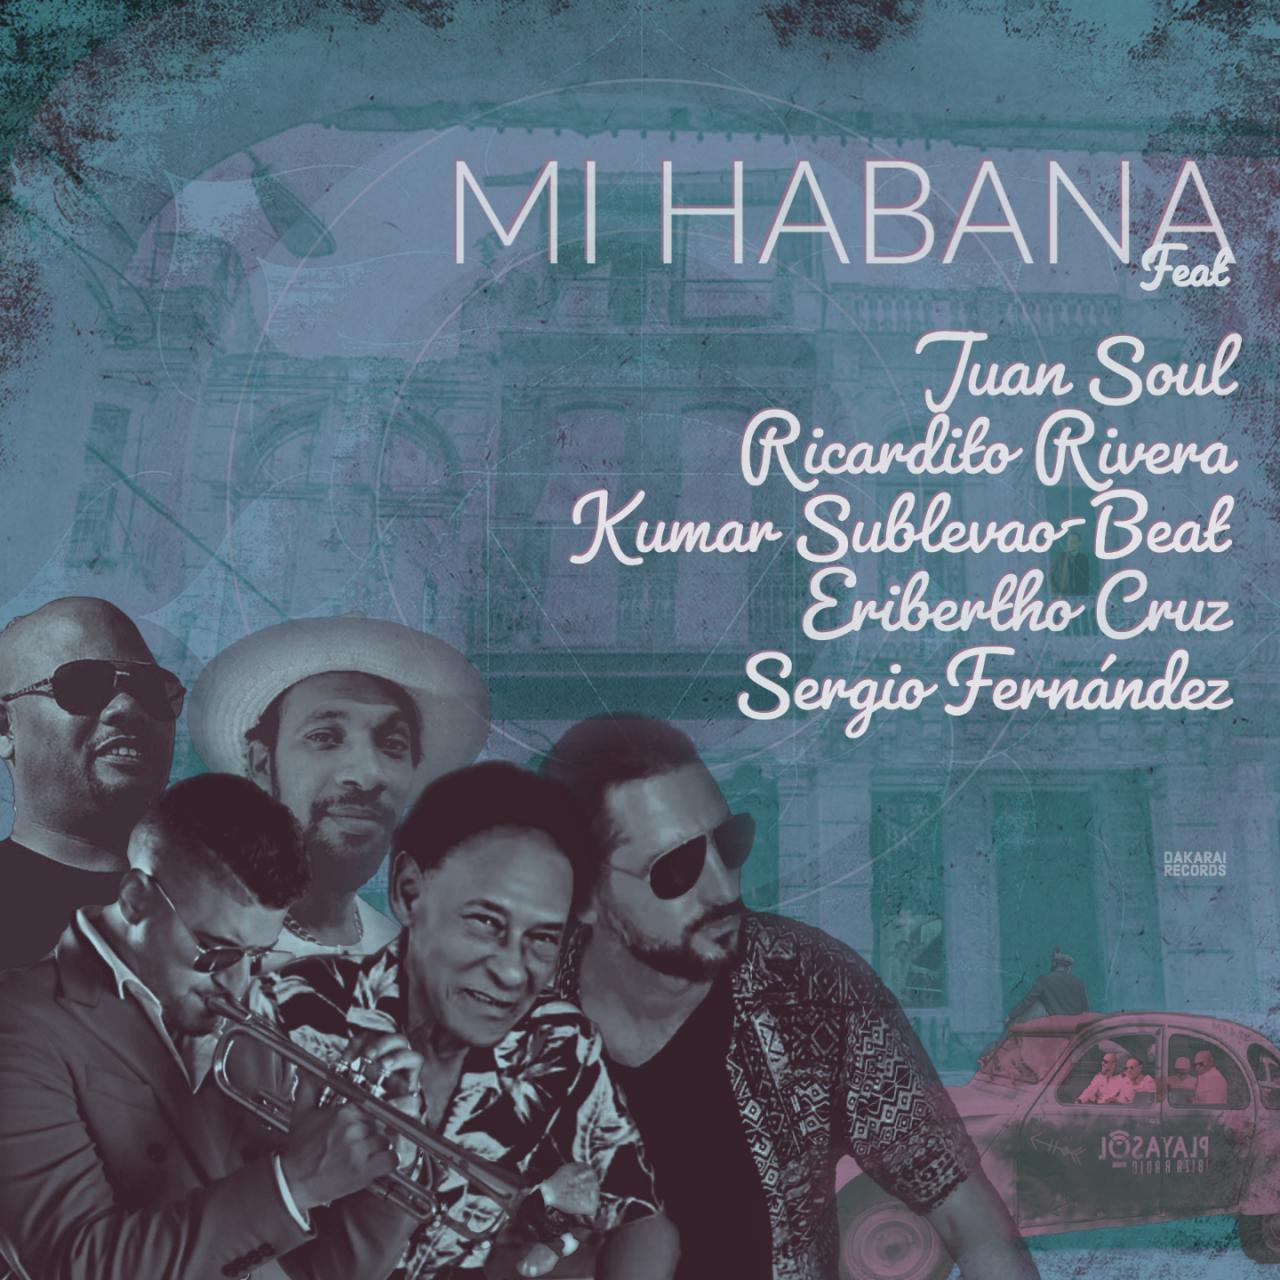 Música para viajar a la vieja Habana